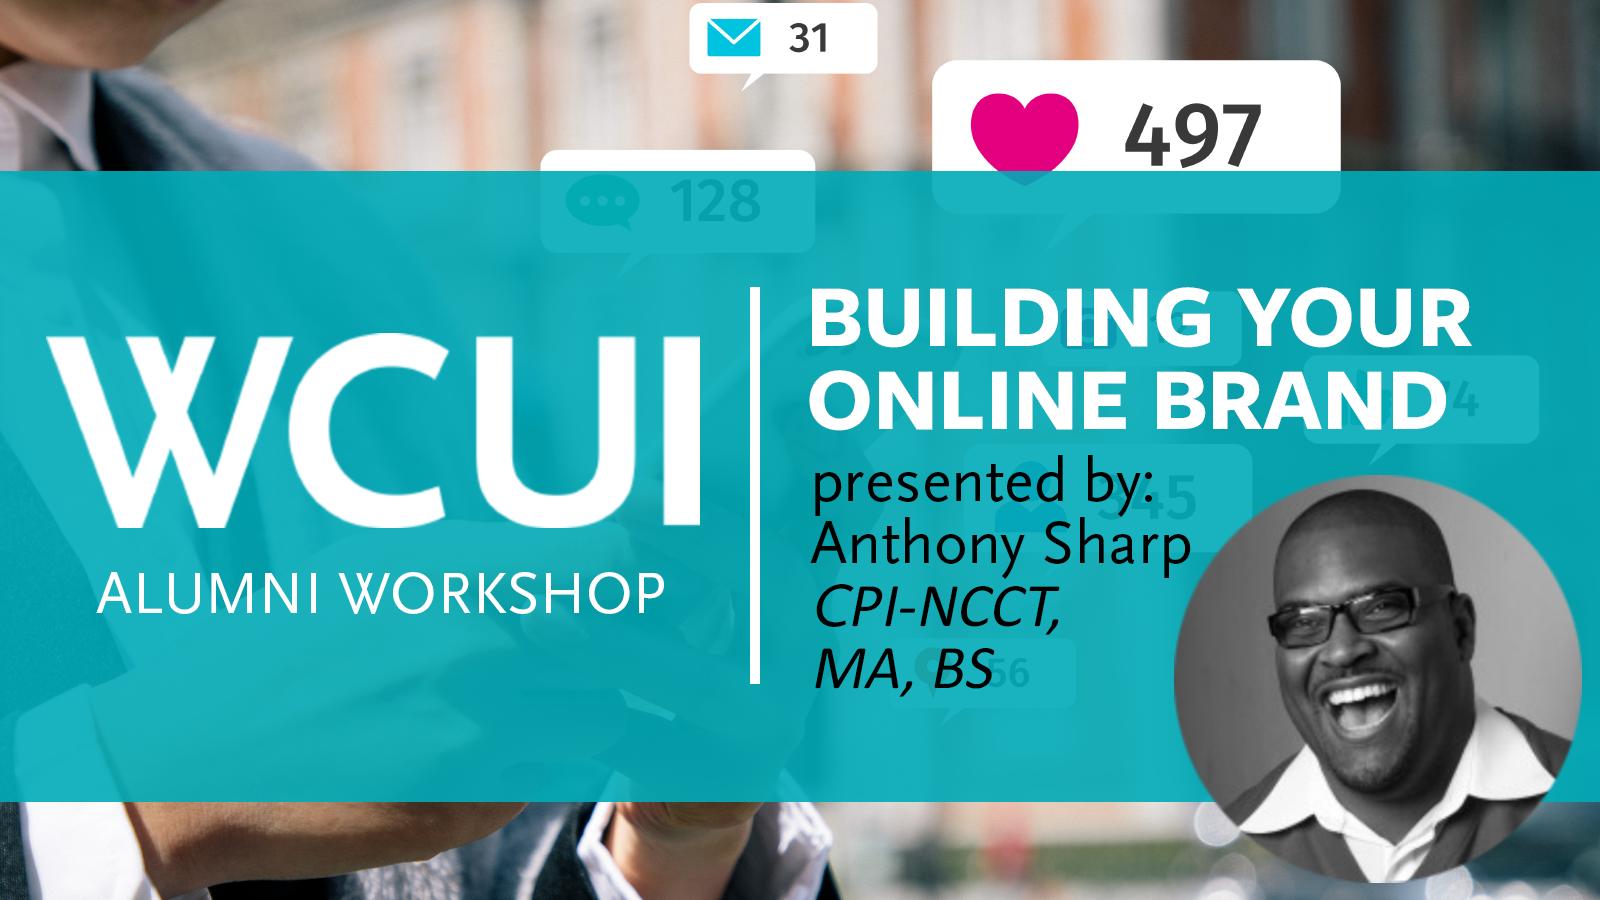 Alumni Workshop - Building Your Online Brand